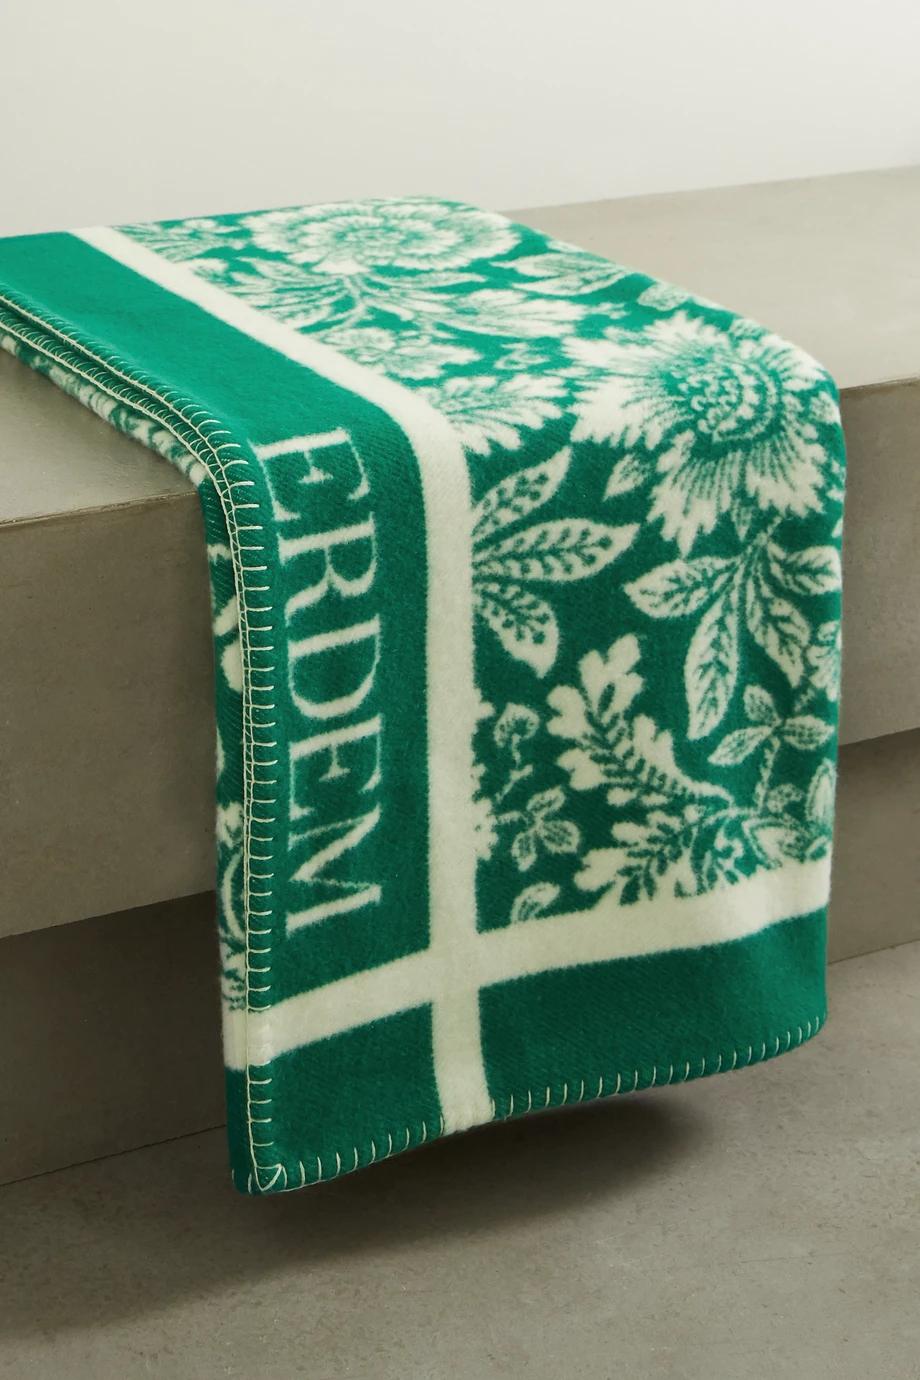 Erdem cashmere and merino wool blanket (Photo credit: Net-a-Porter)